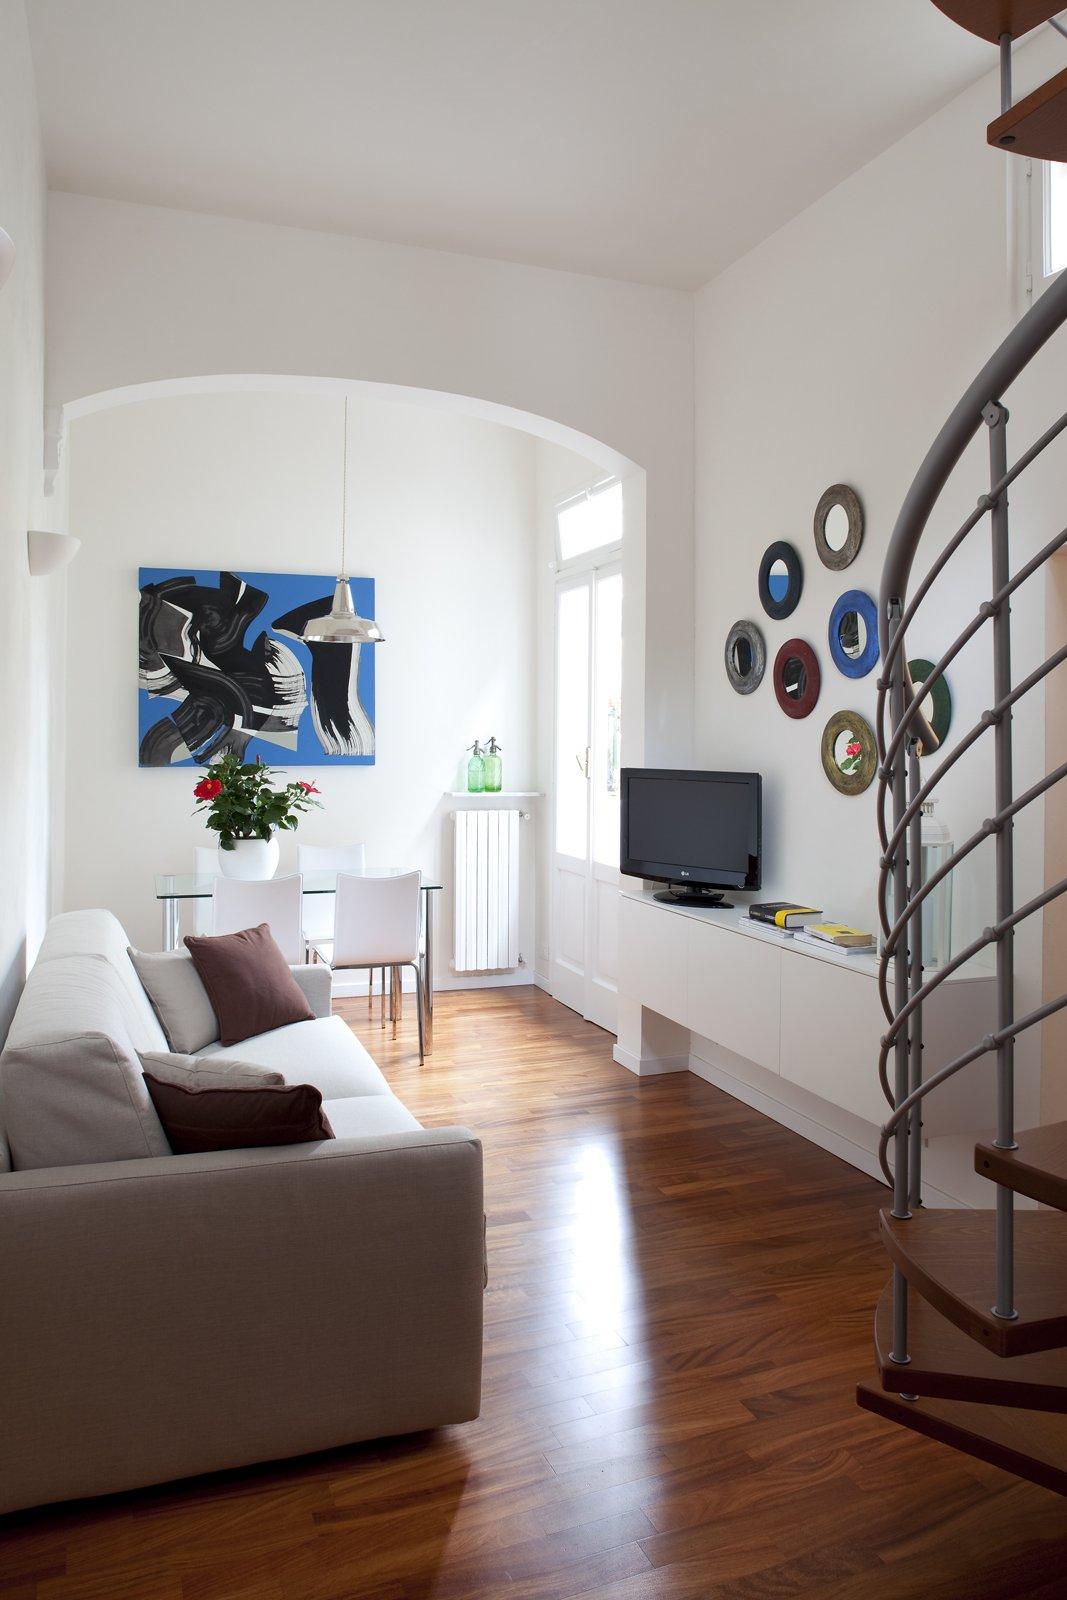 48 mq bilocale su due livelli cose di casa for Immagini di appartamenti moderni